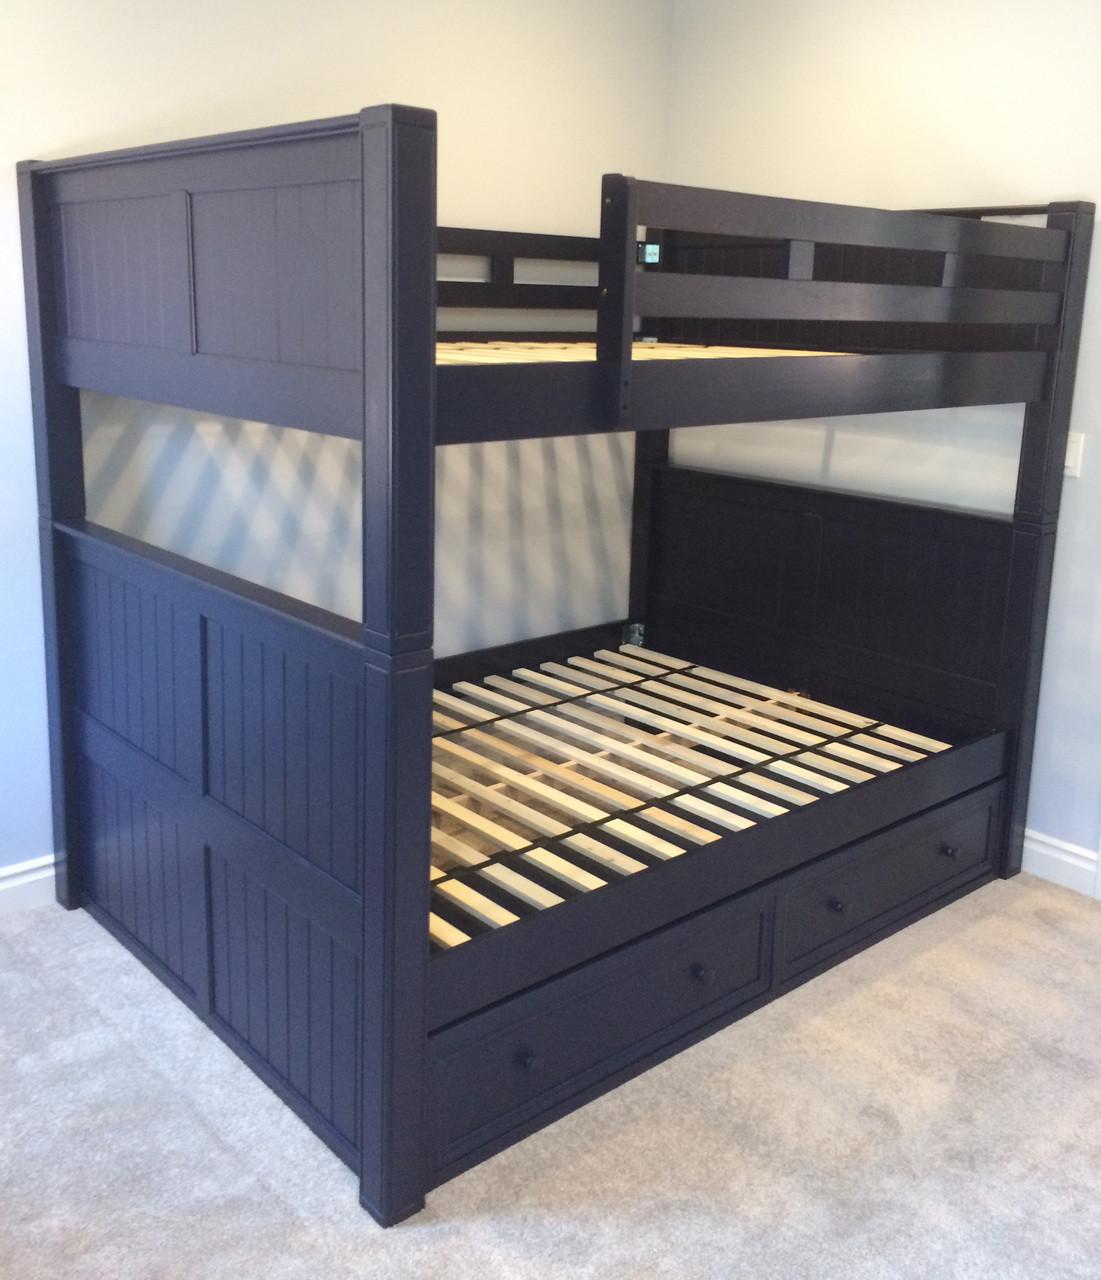 bed abode wood platform platformbed humble sage nightdayfurniture with trundle in natural storage basic basicsage full